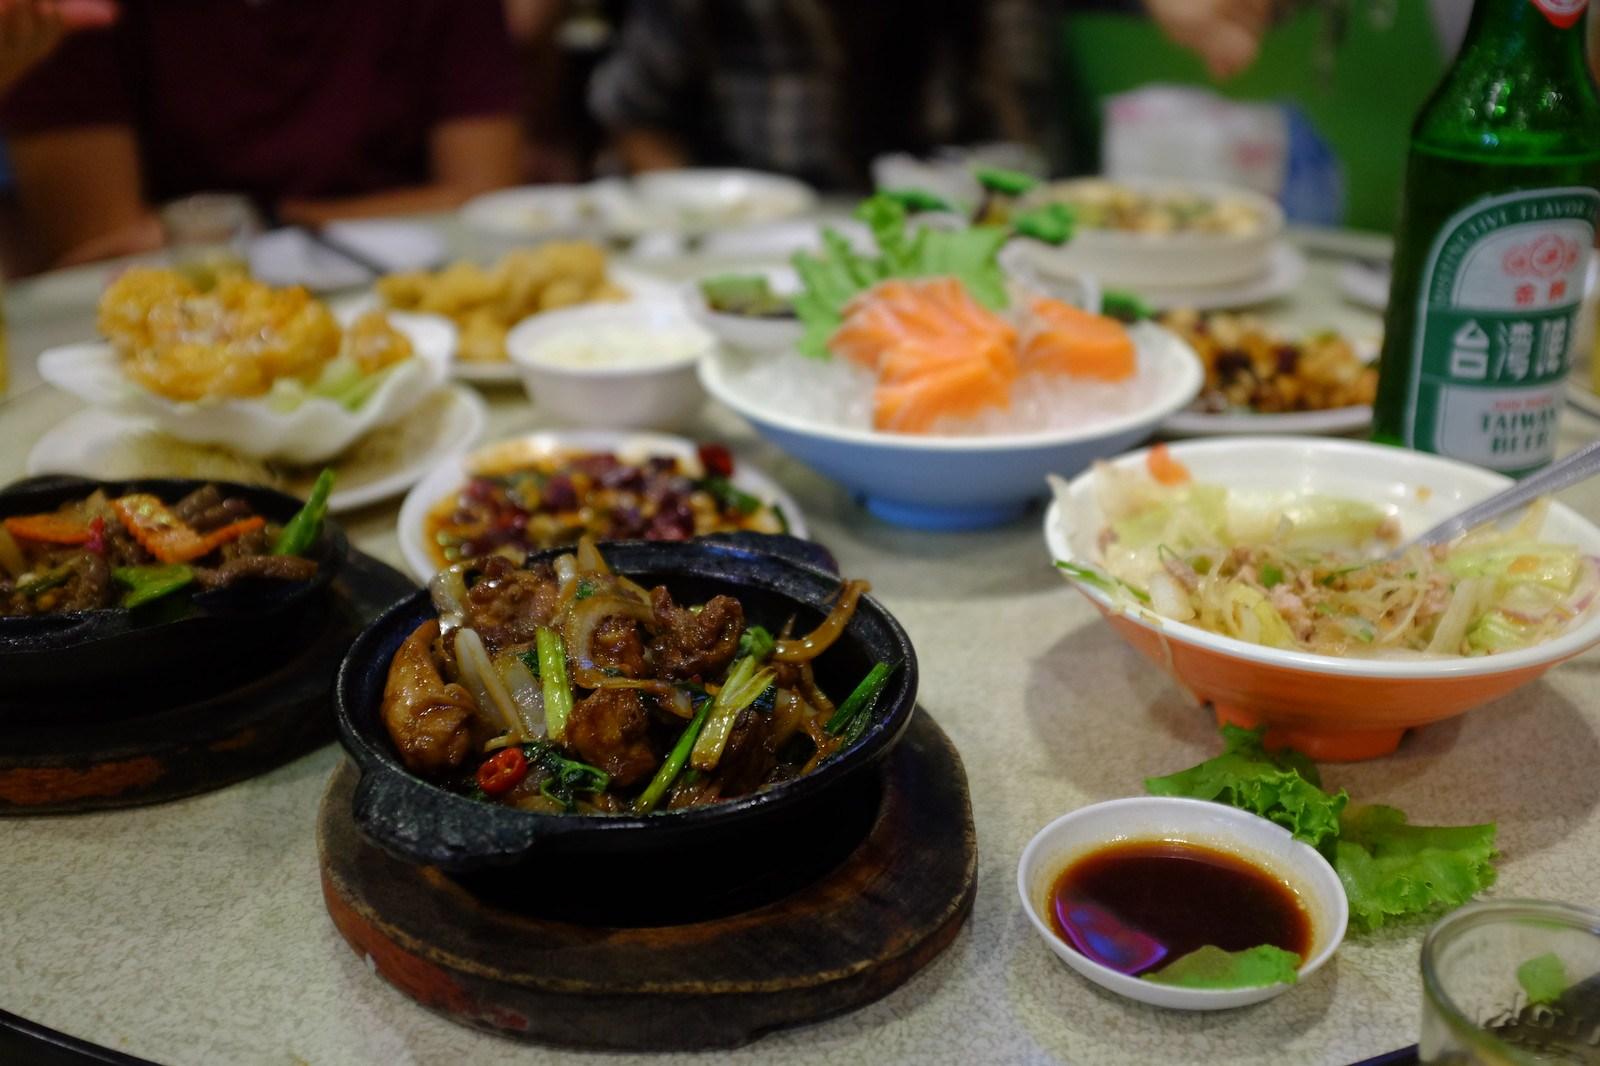 Platos en un restaurante típico